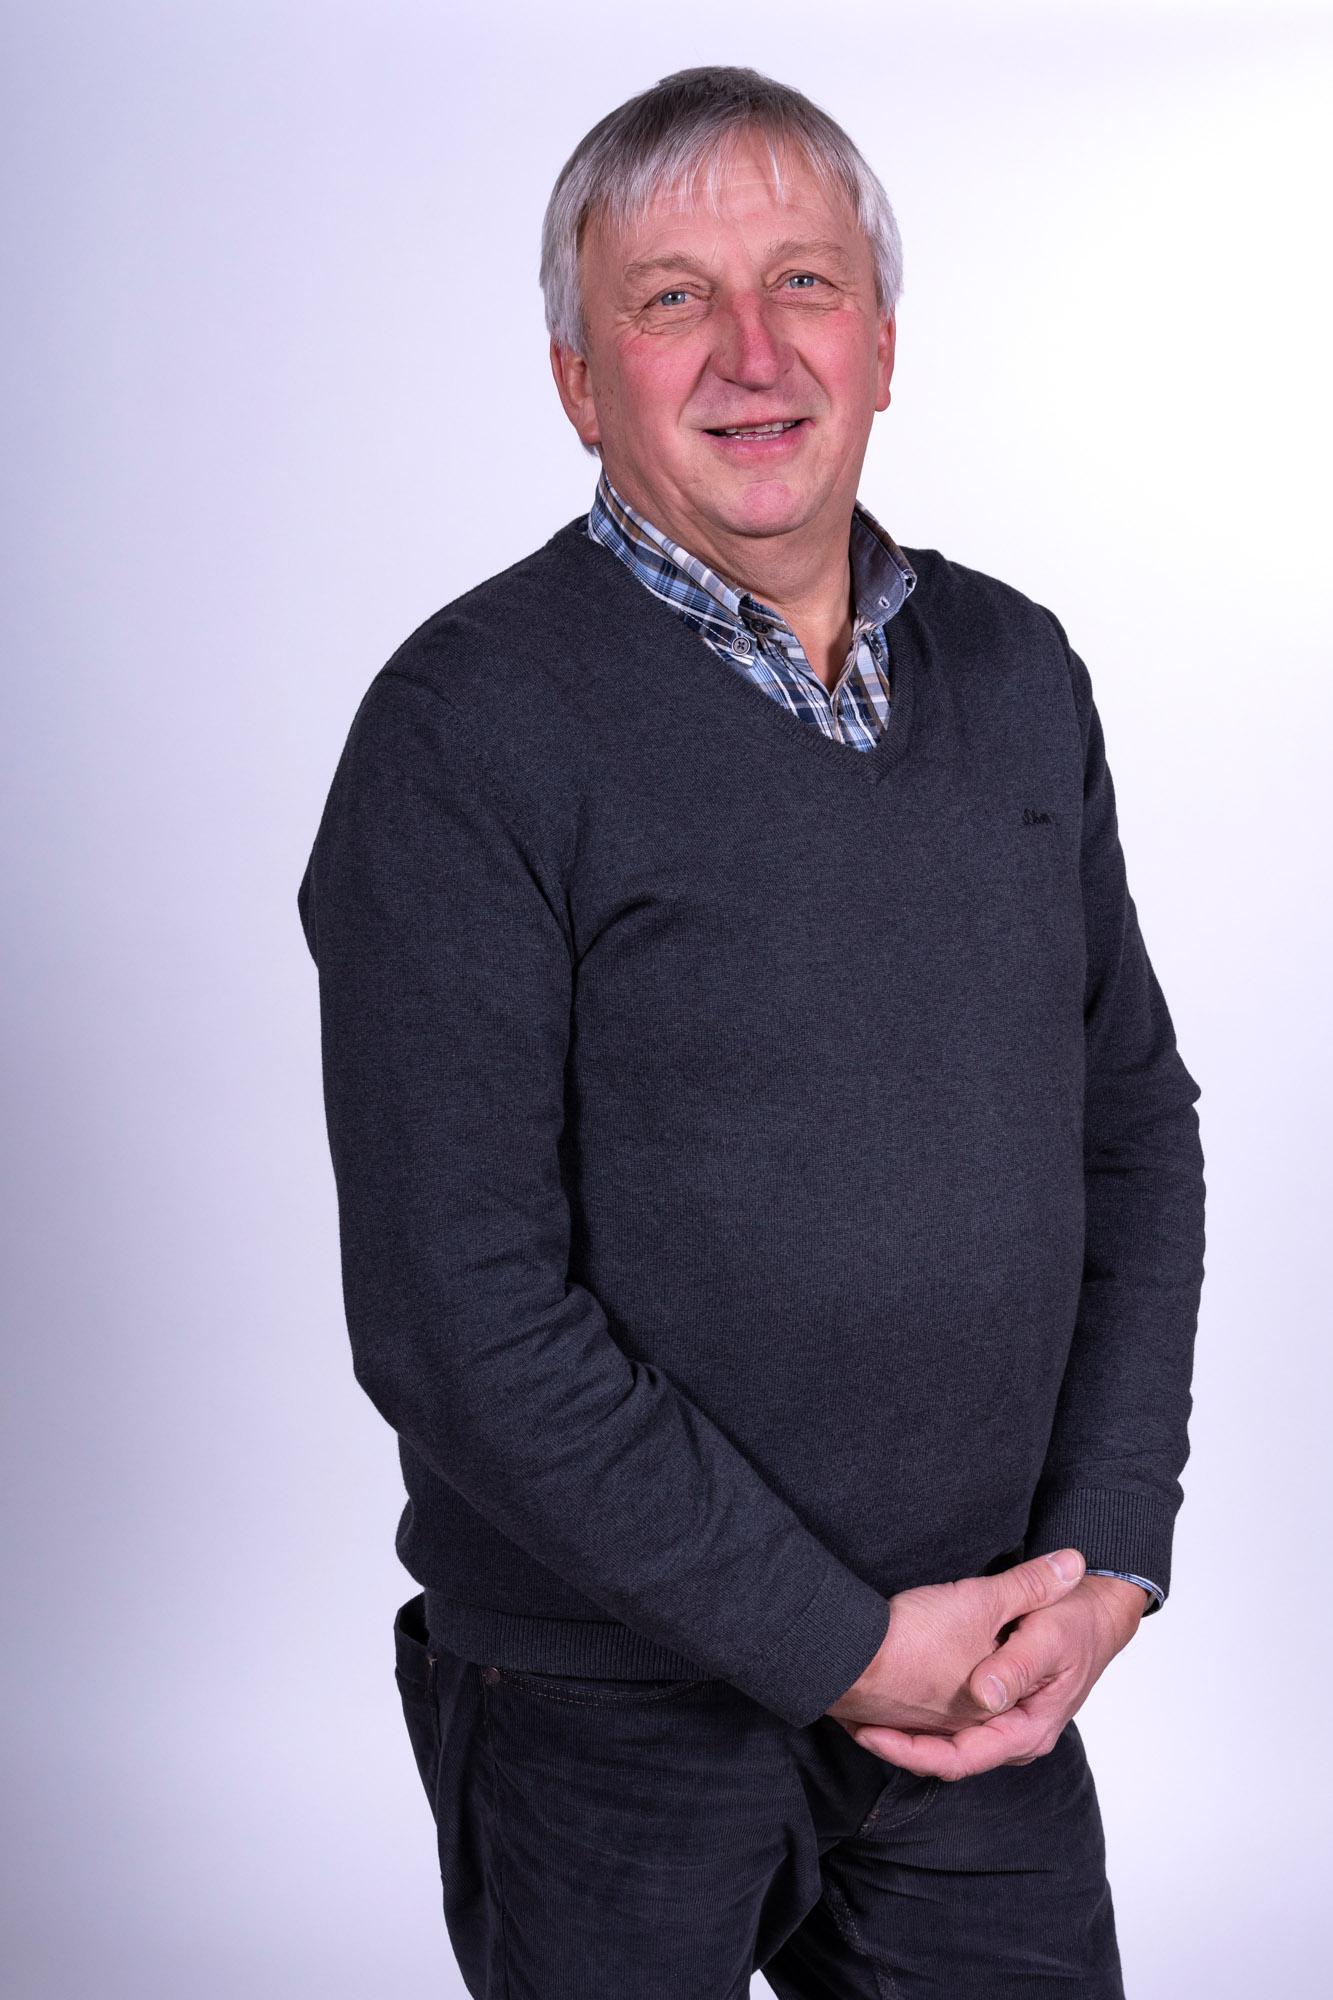 Dieter Thommes